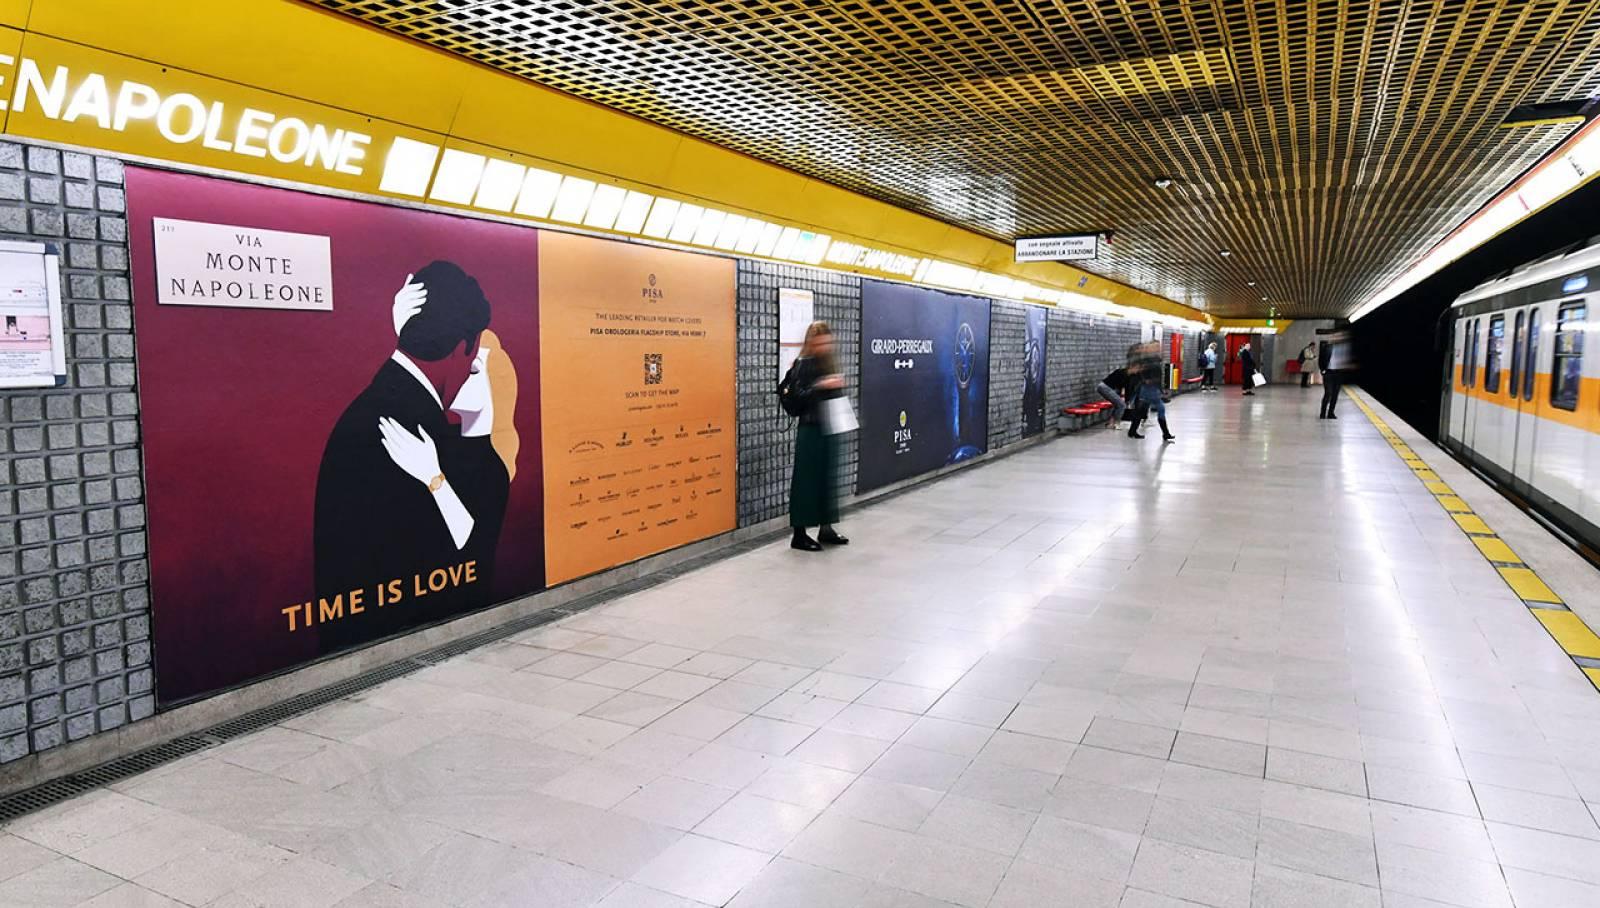 Pubblicità Out of Home IGPDecaux a Milano Station Domination per Pisa Orologeria